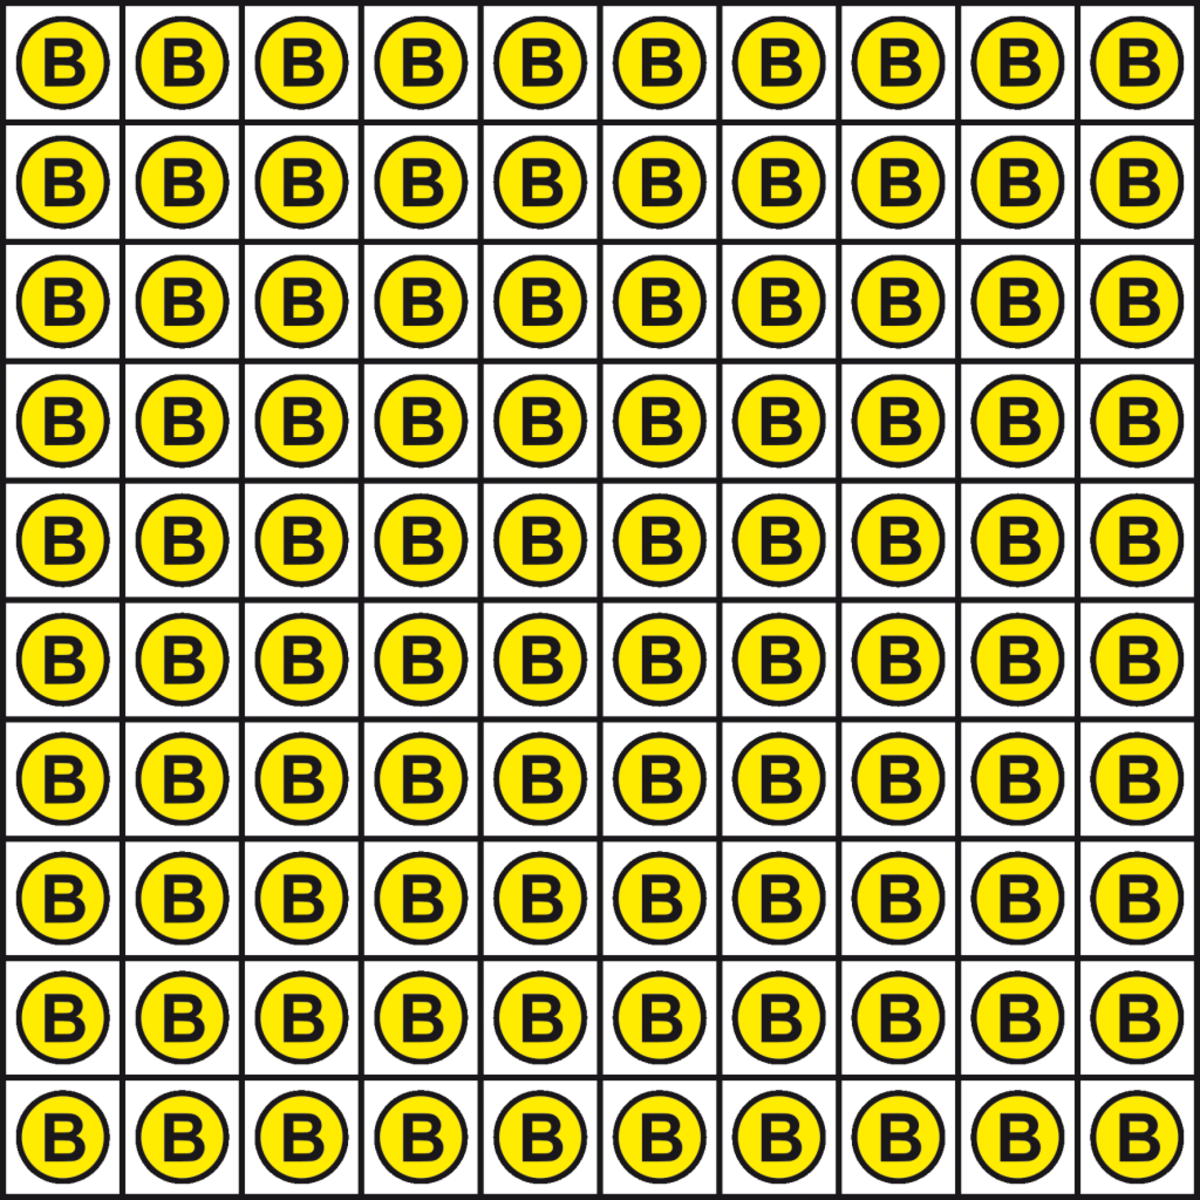 FIGURE 1: a 10x10 bitcoin field